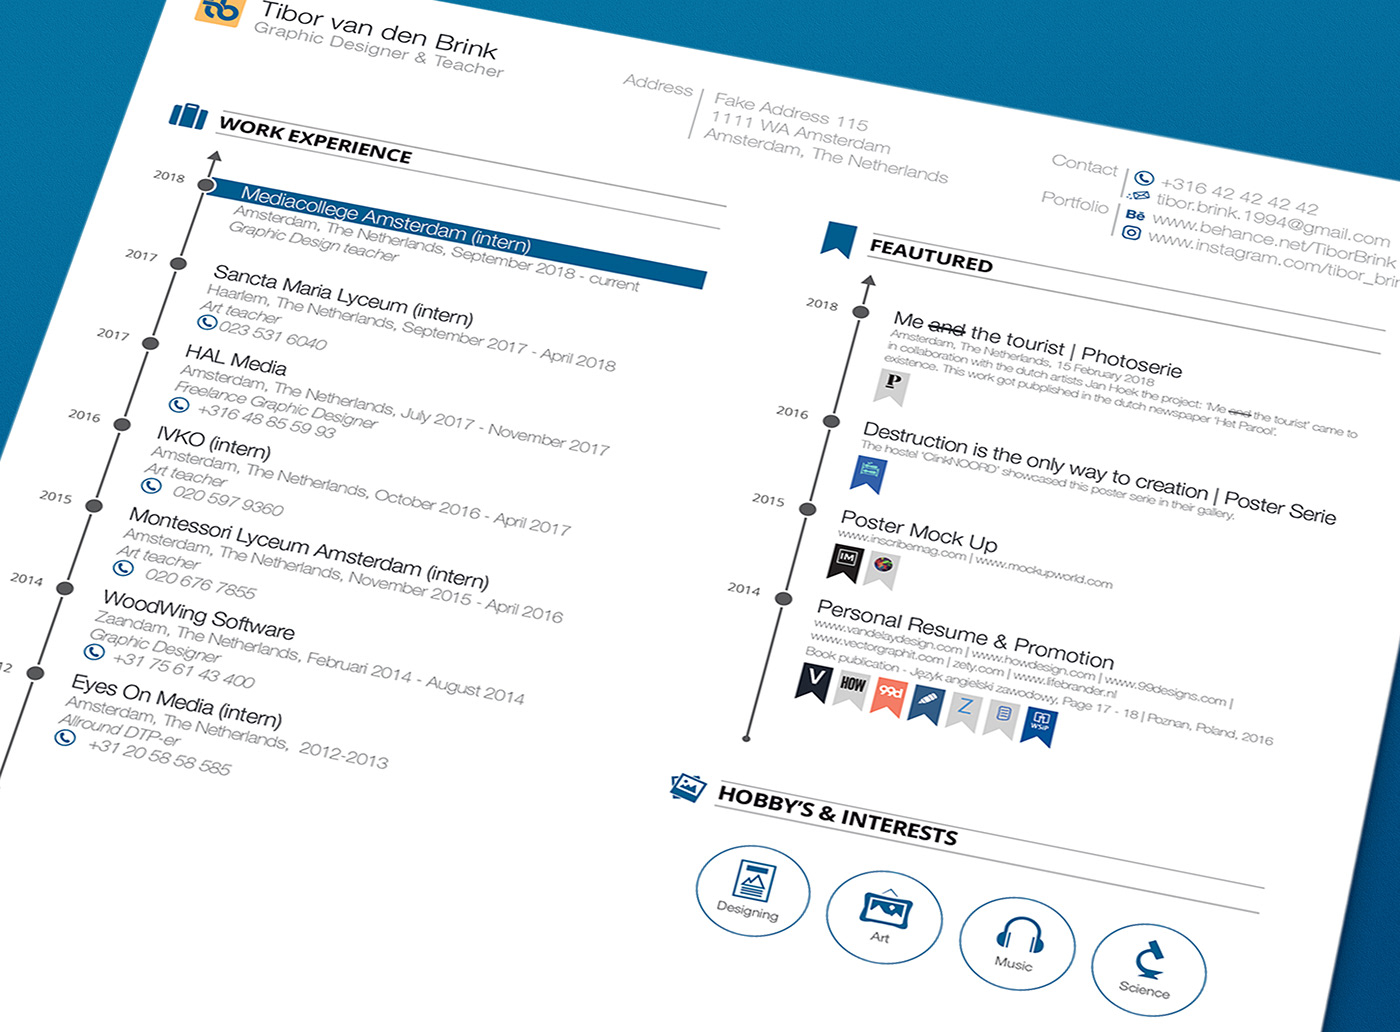 Resume CV brand Promotion resume mock-up advertisement infographic Curriculum Vitae creative tibor